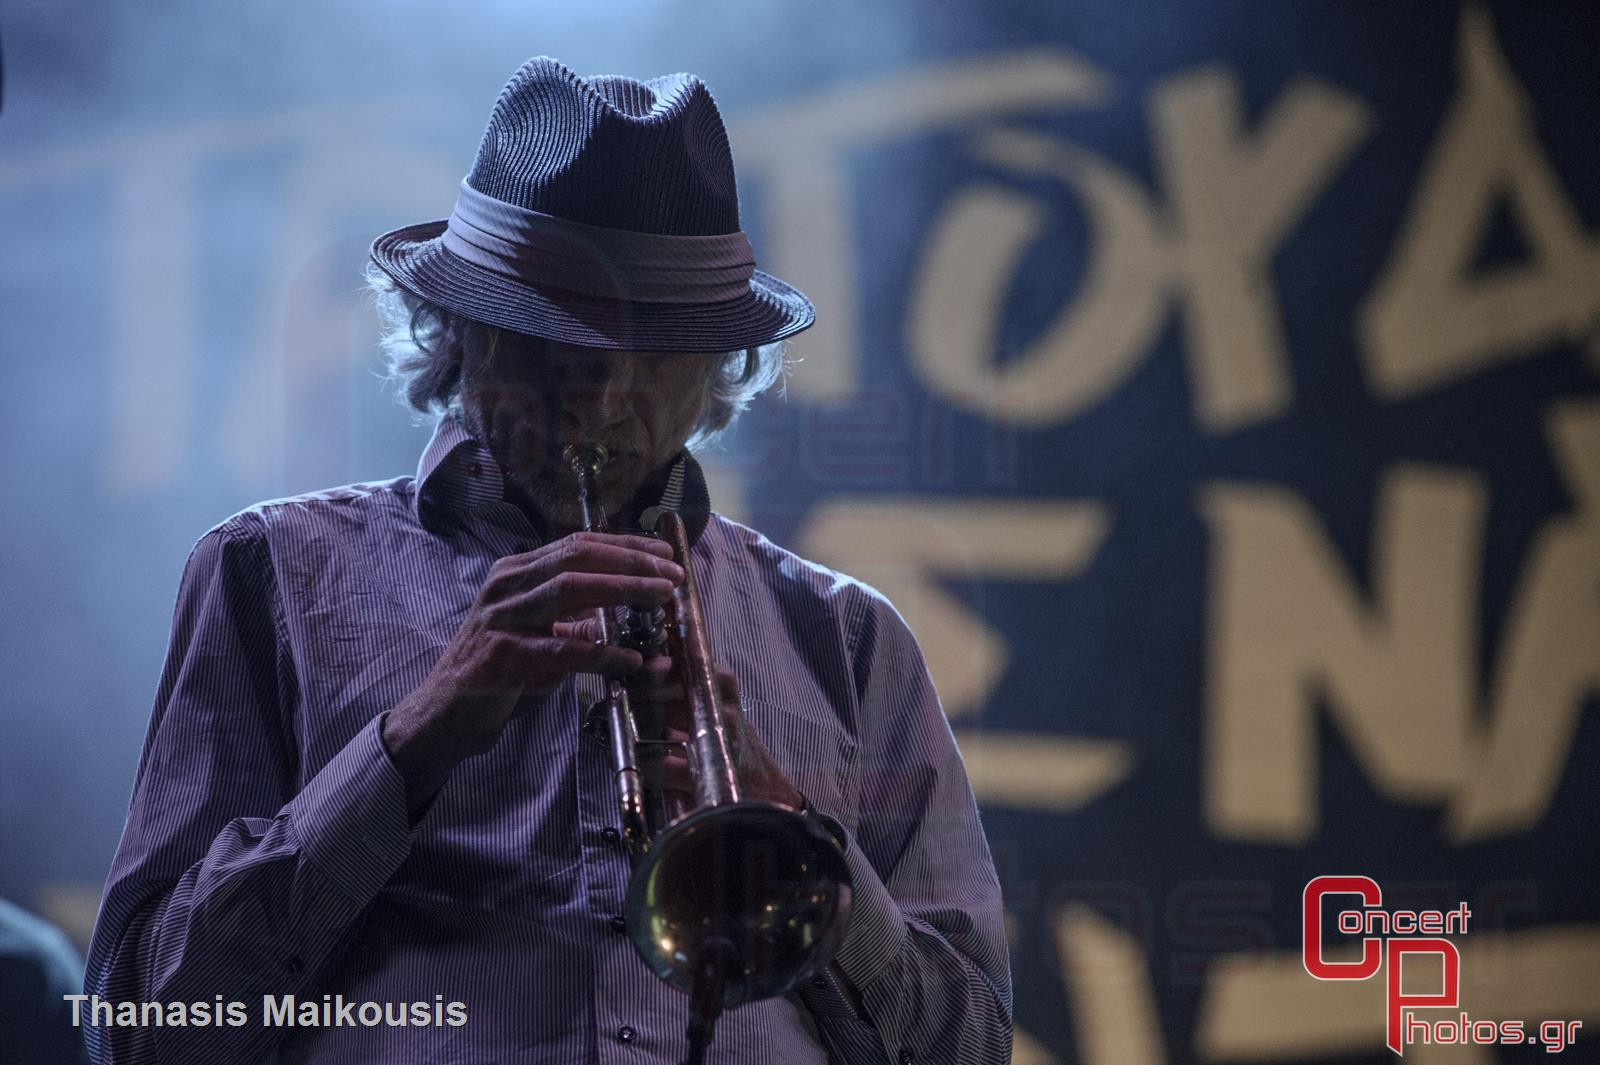 Active Member - Τραγούδα μας να φύγει το σκοτάδι- photographer: Thanasis Maikousis - concertphotos_-5461